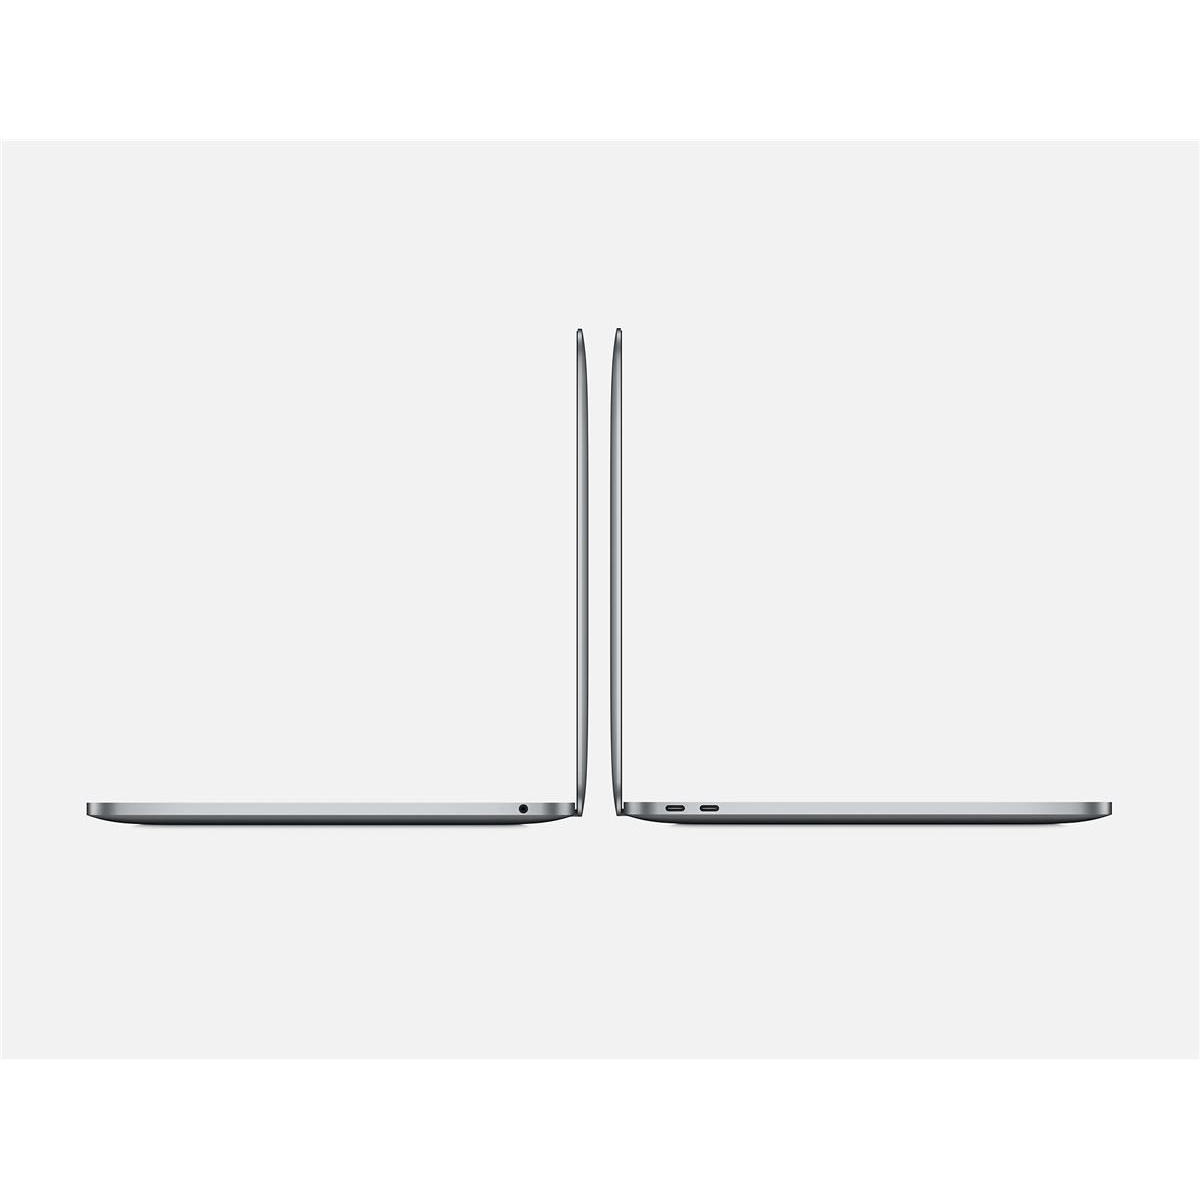 Apple MacBook Pro Mac OS Wi-Fi 8GB RAM 128GB SDD 10-hour Battery 13in Space Grey Ref MPXQ2B/A